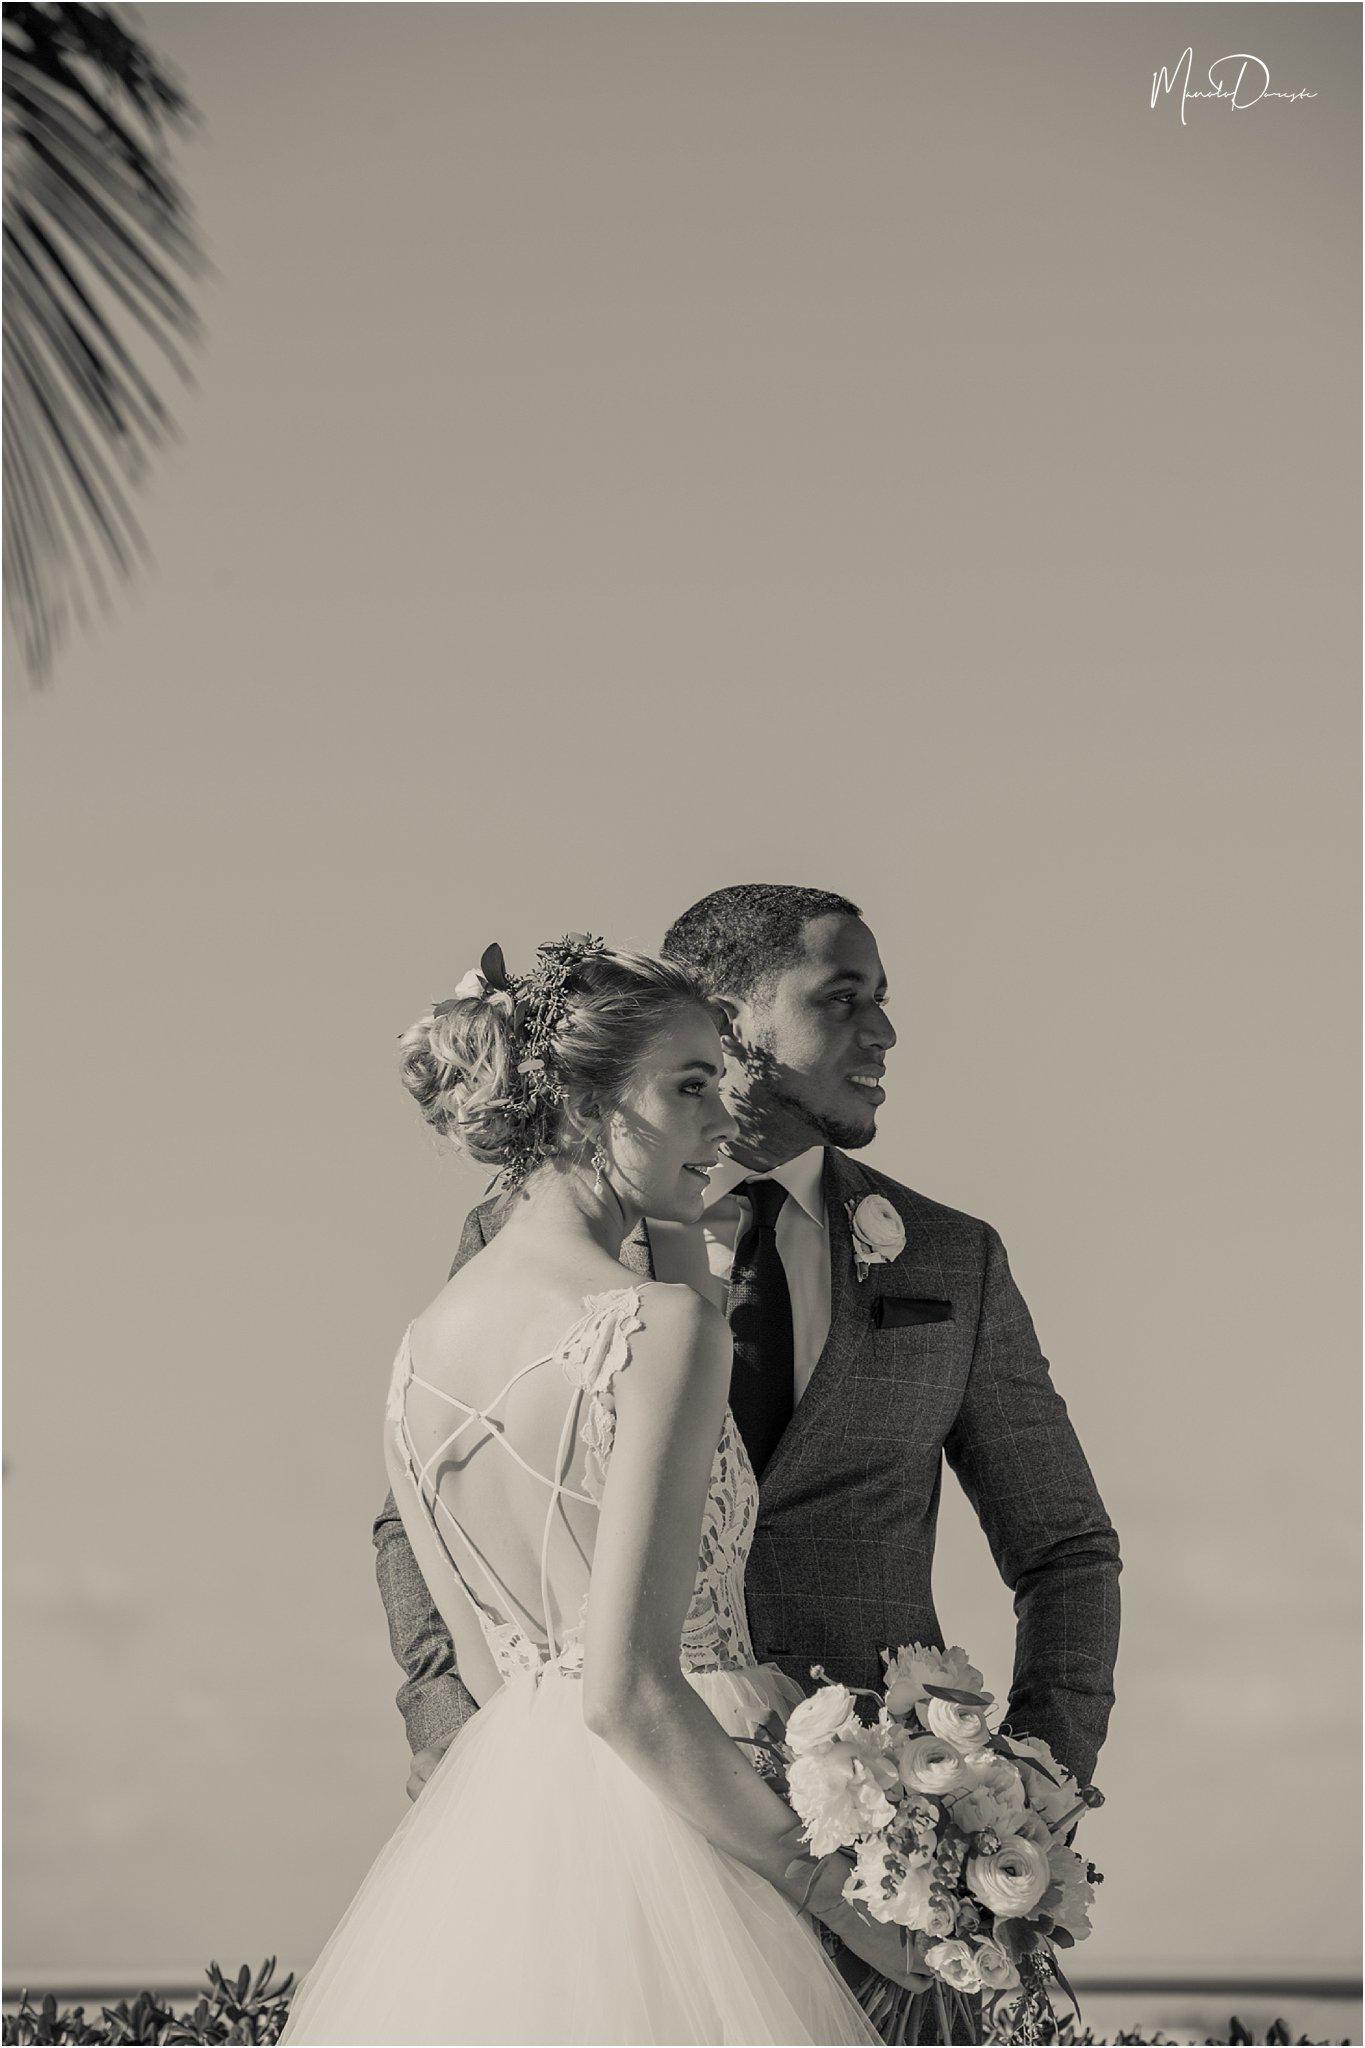 00882_ManoloDoreste_InFocusStudios_Wedding_Family_Photography_Miami_MiamiPhotographer.jpg